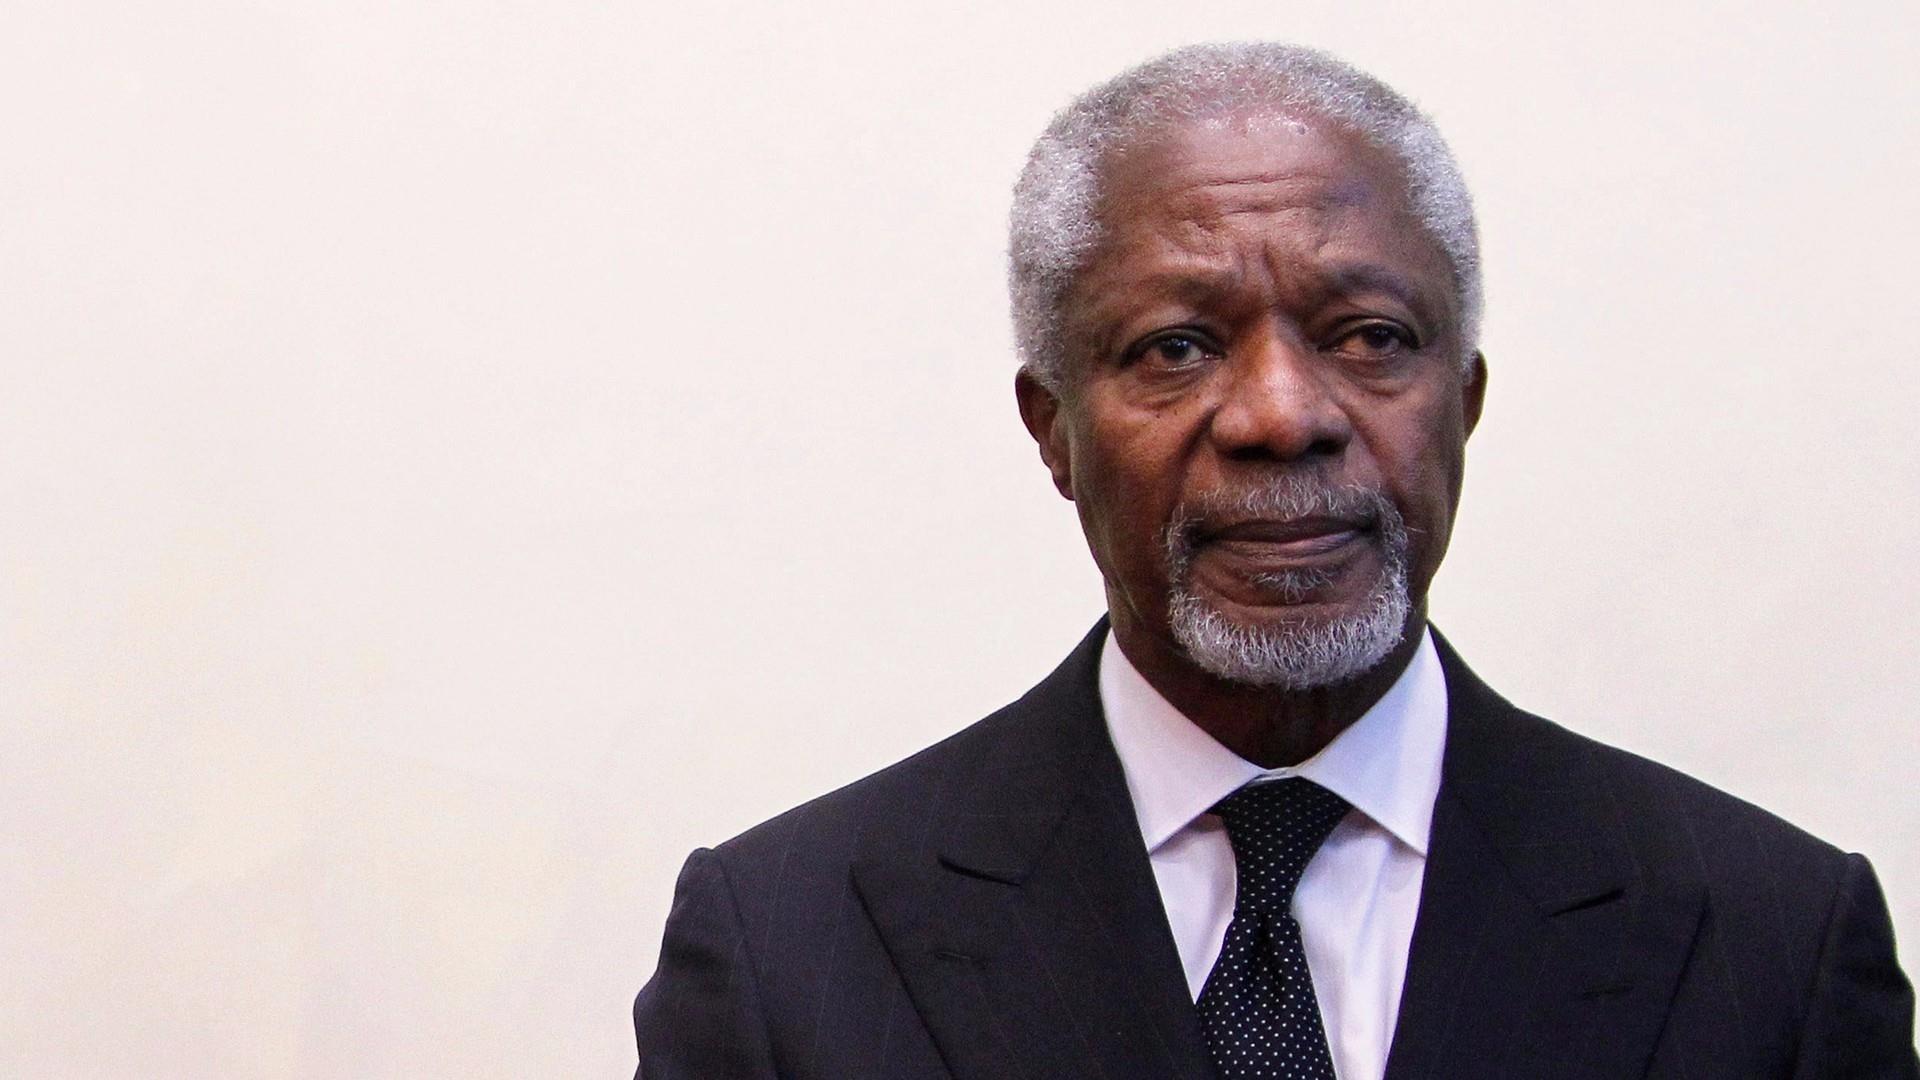 Fmr. United Nations Secretary-General Kofi Annan dies at age 80